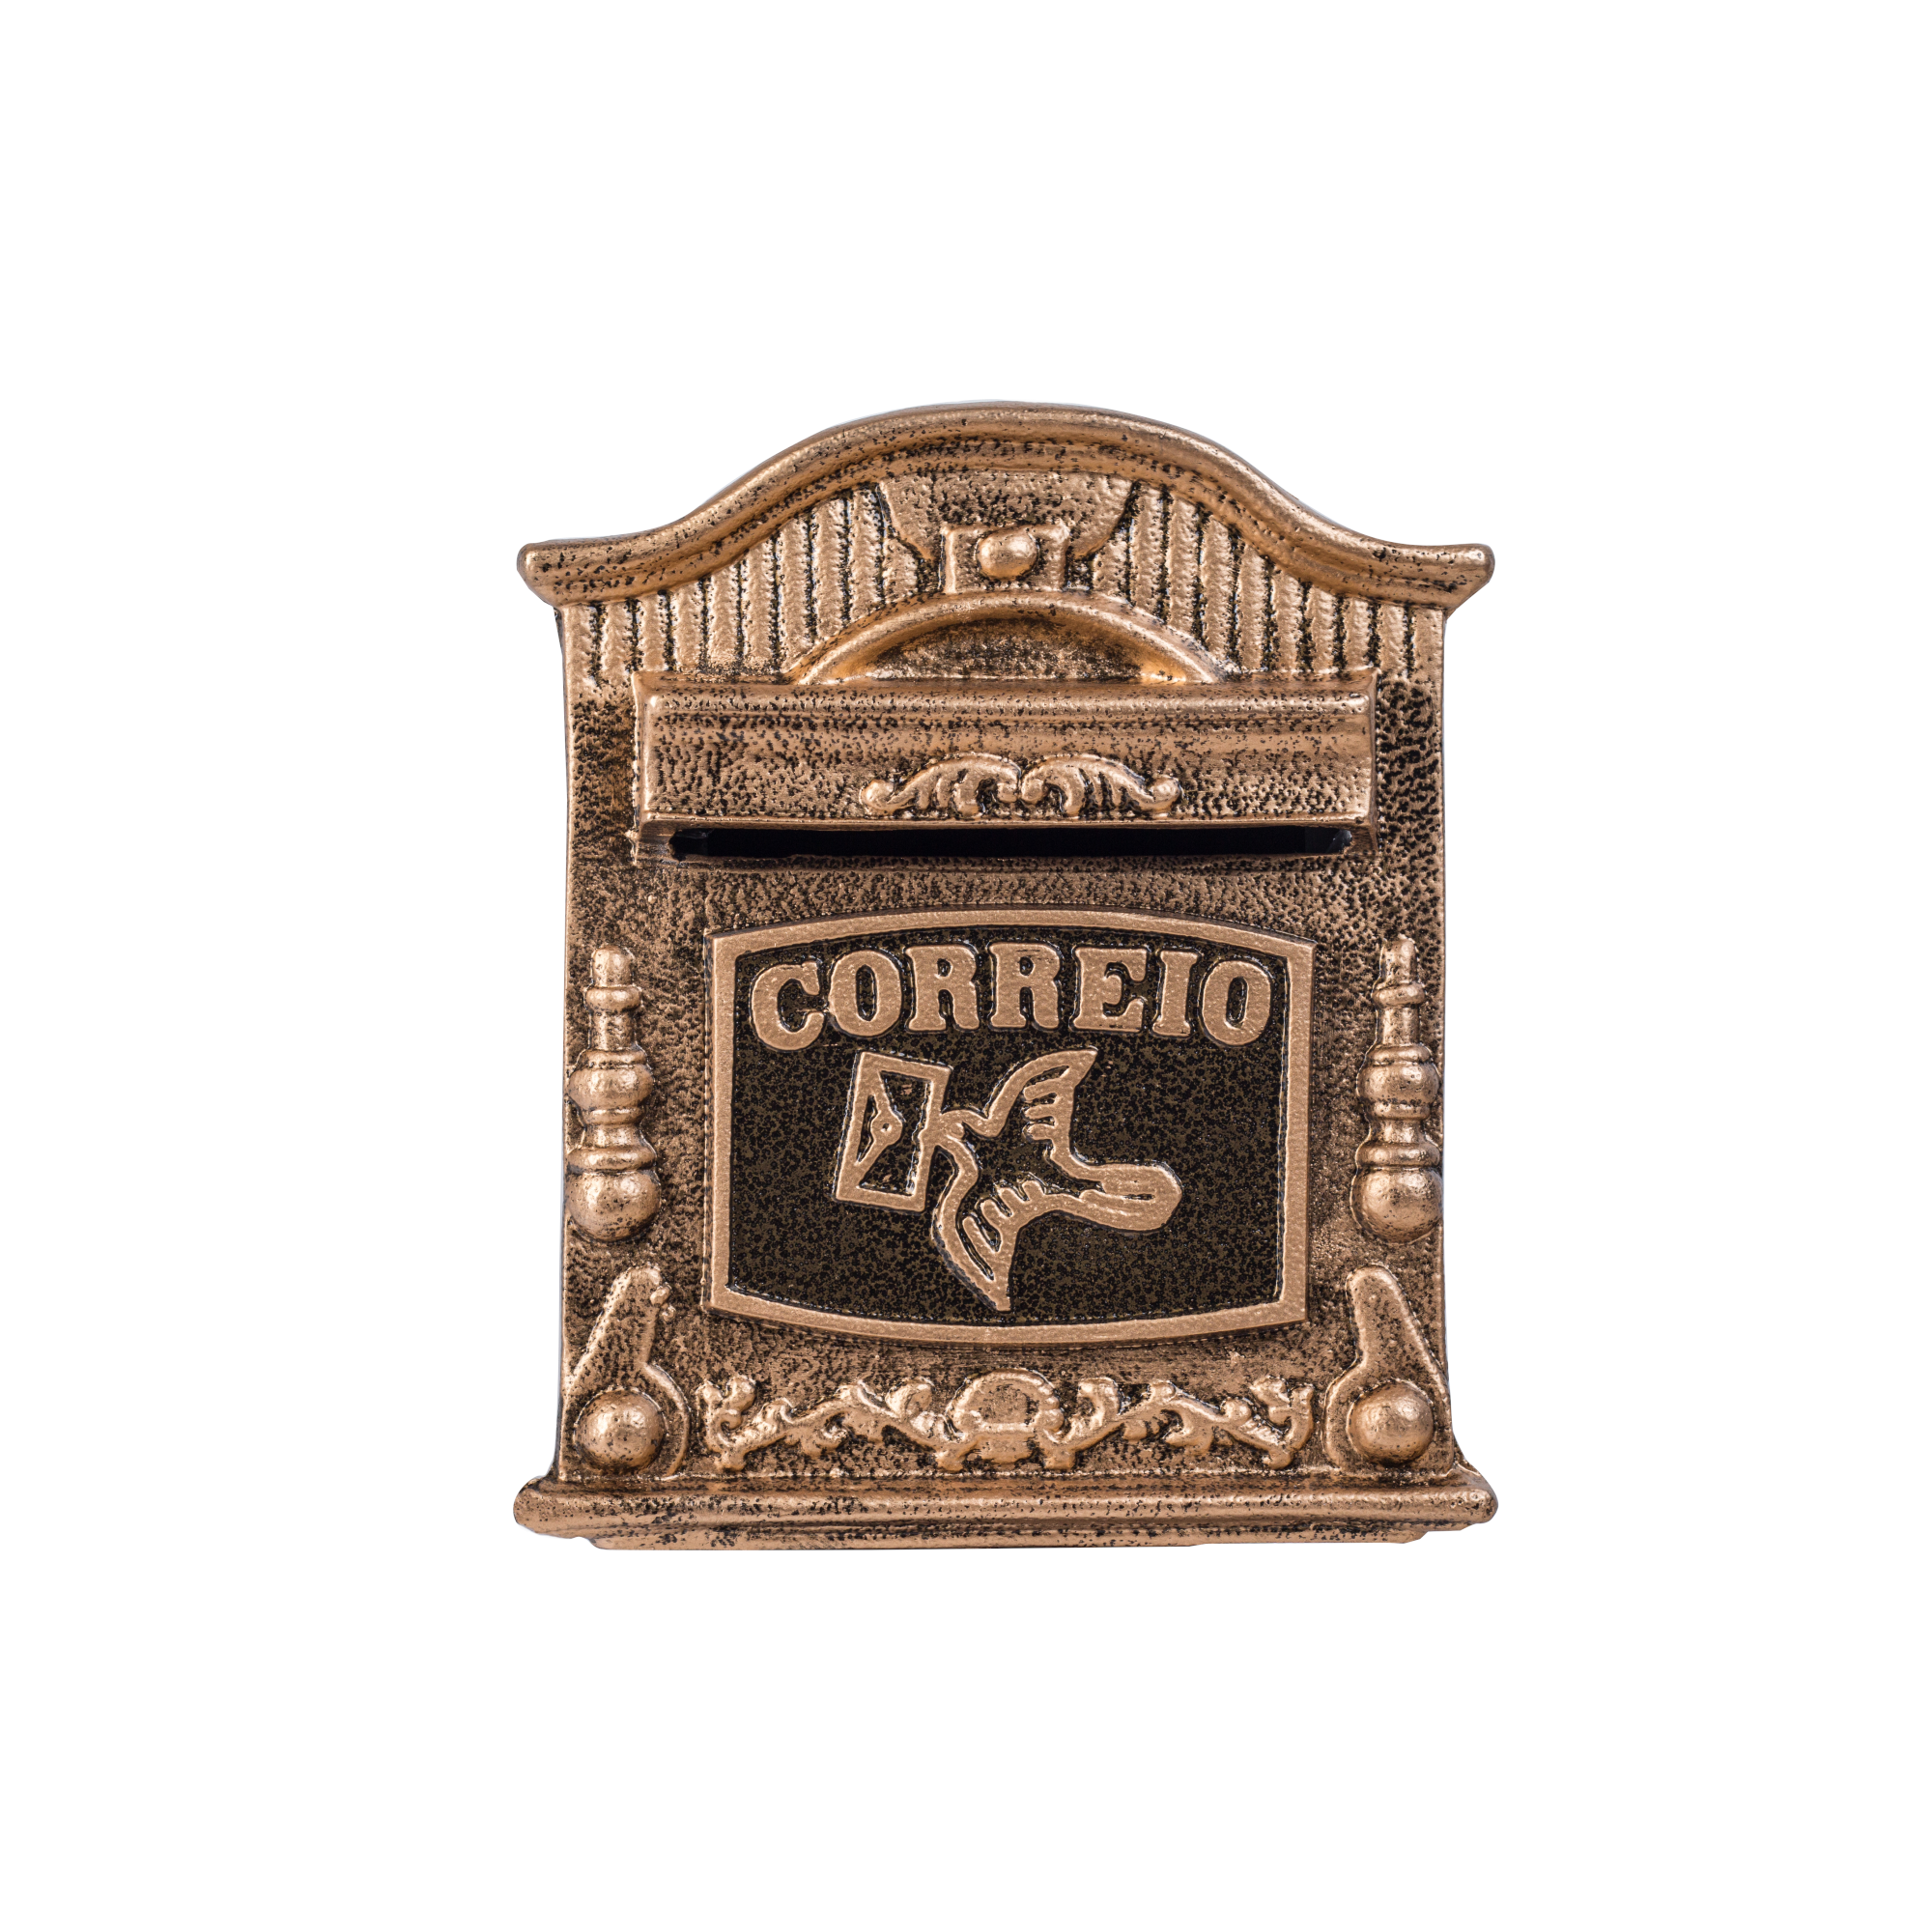 Porta Carta Escovado de Aluminio Reciclavel 19x16x24cm Dourado - LGMais